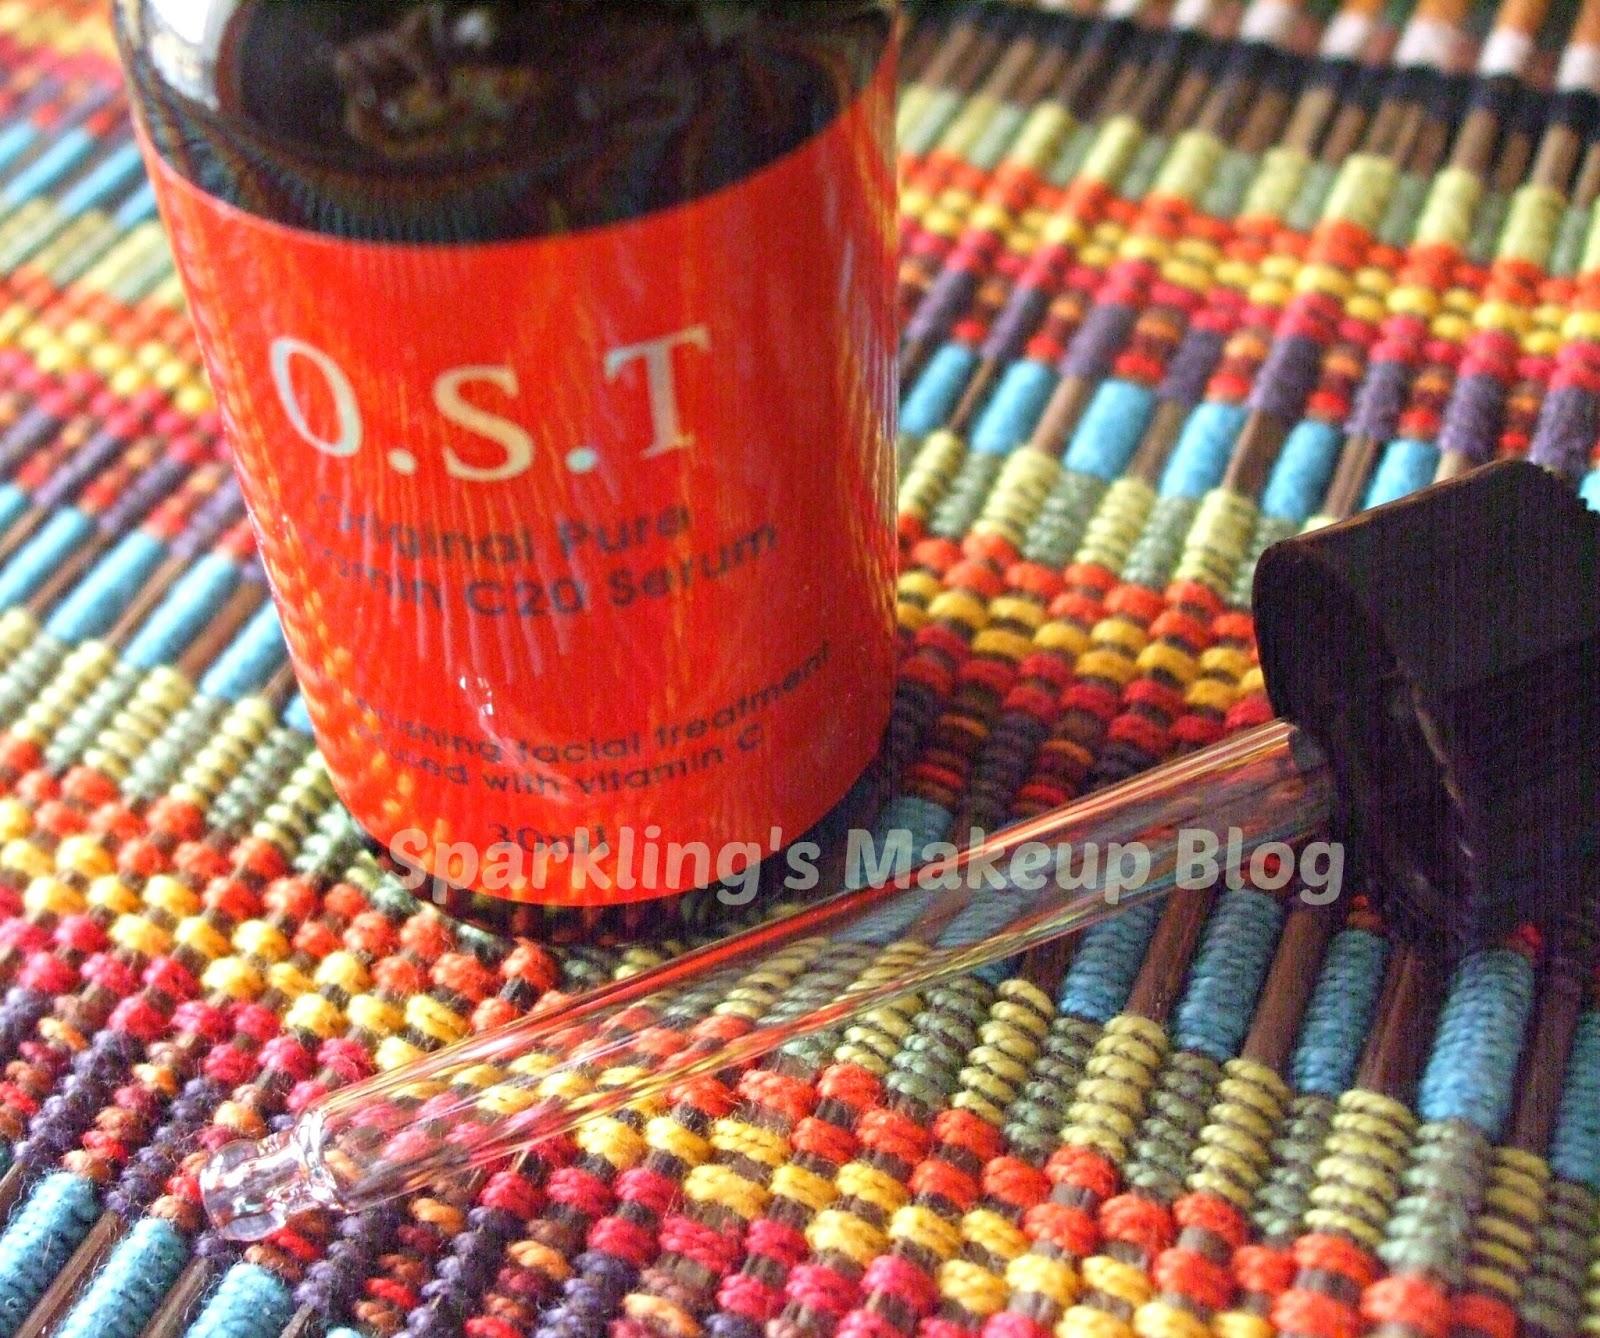 Ost Original Pure Vitamin C20 Serum Review Sparkling Palette Blog 30ml